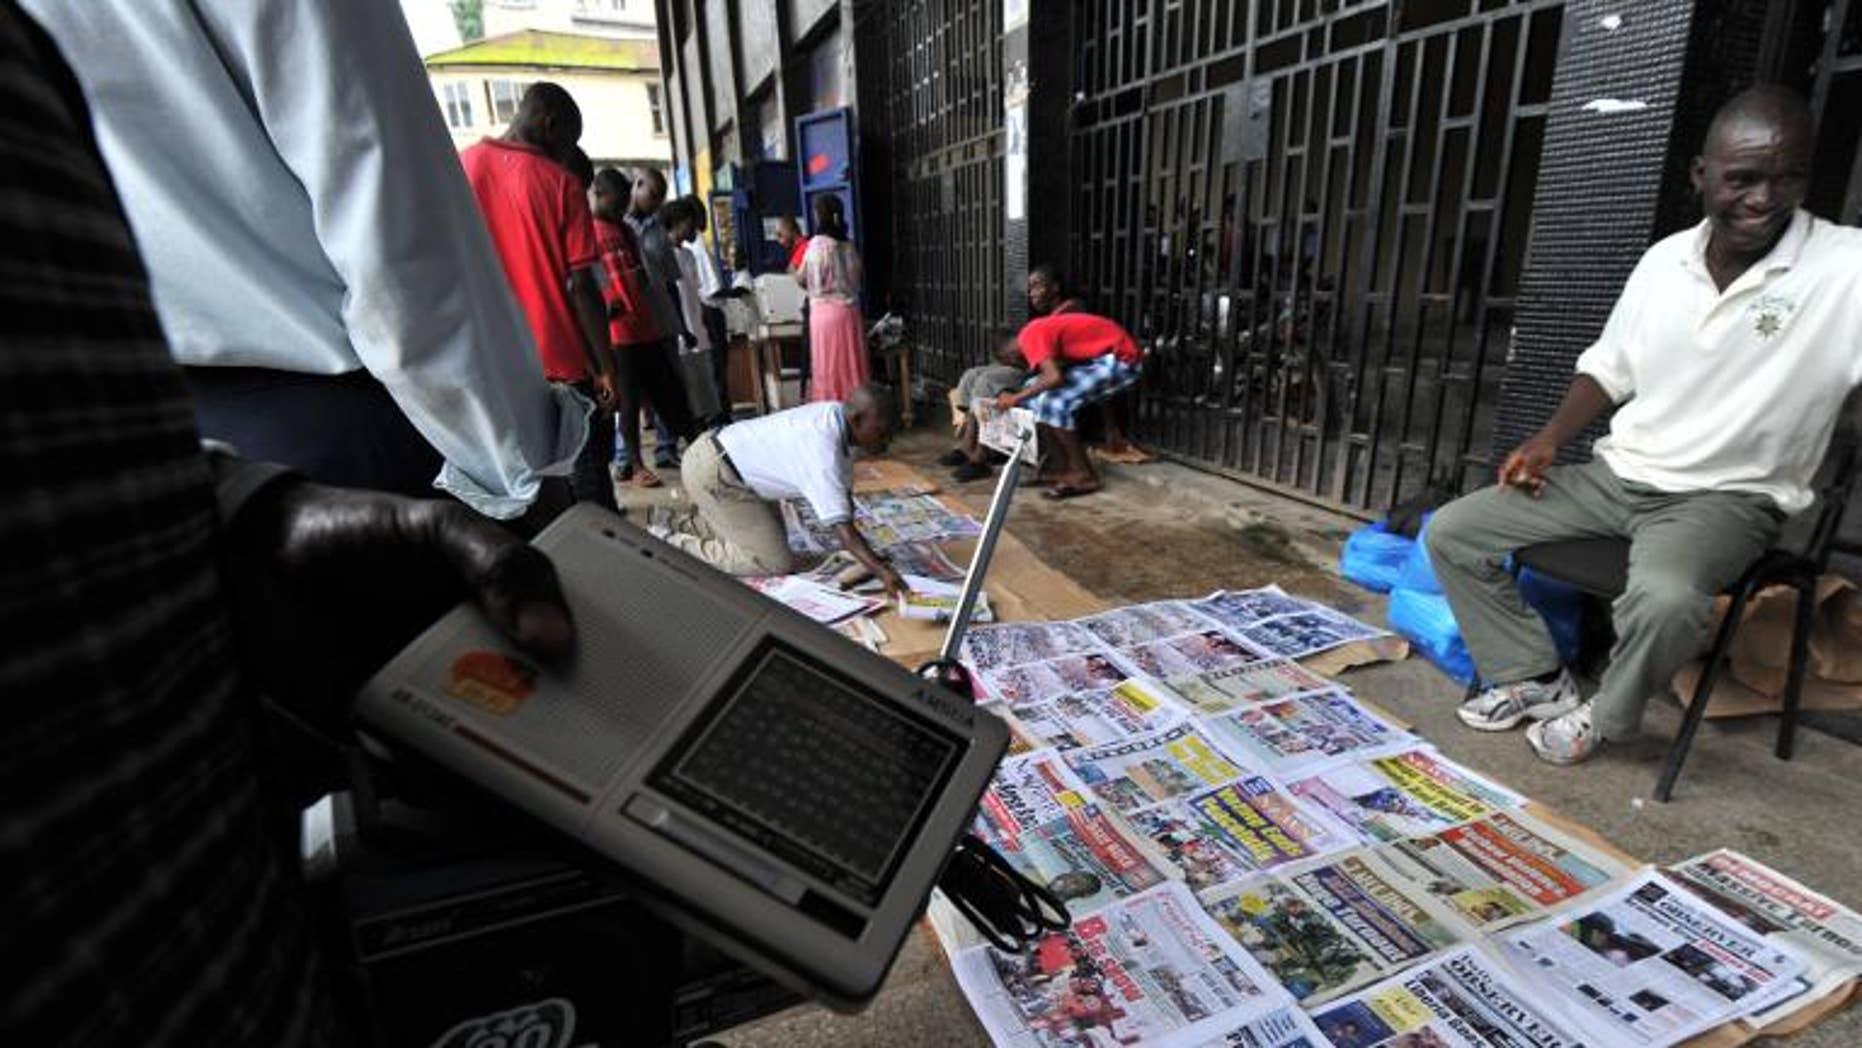 People look at newspaper headlines on a street in Monrovia on October 12, 2011